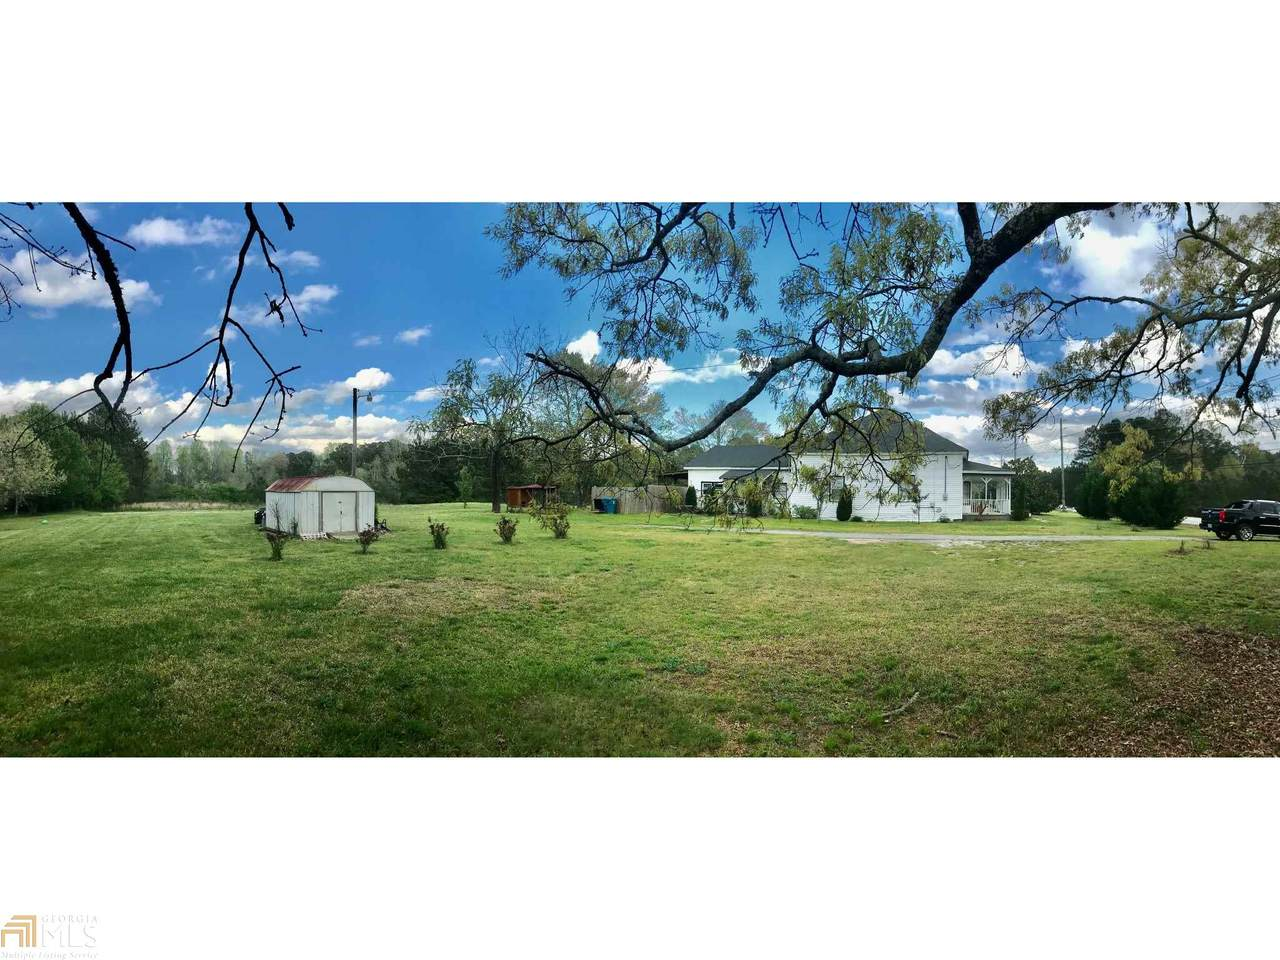 50 Auburn Rd - Photo 1